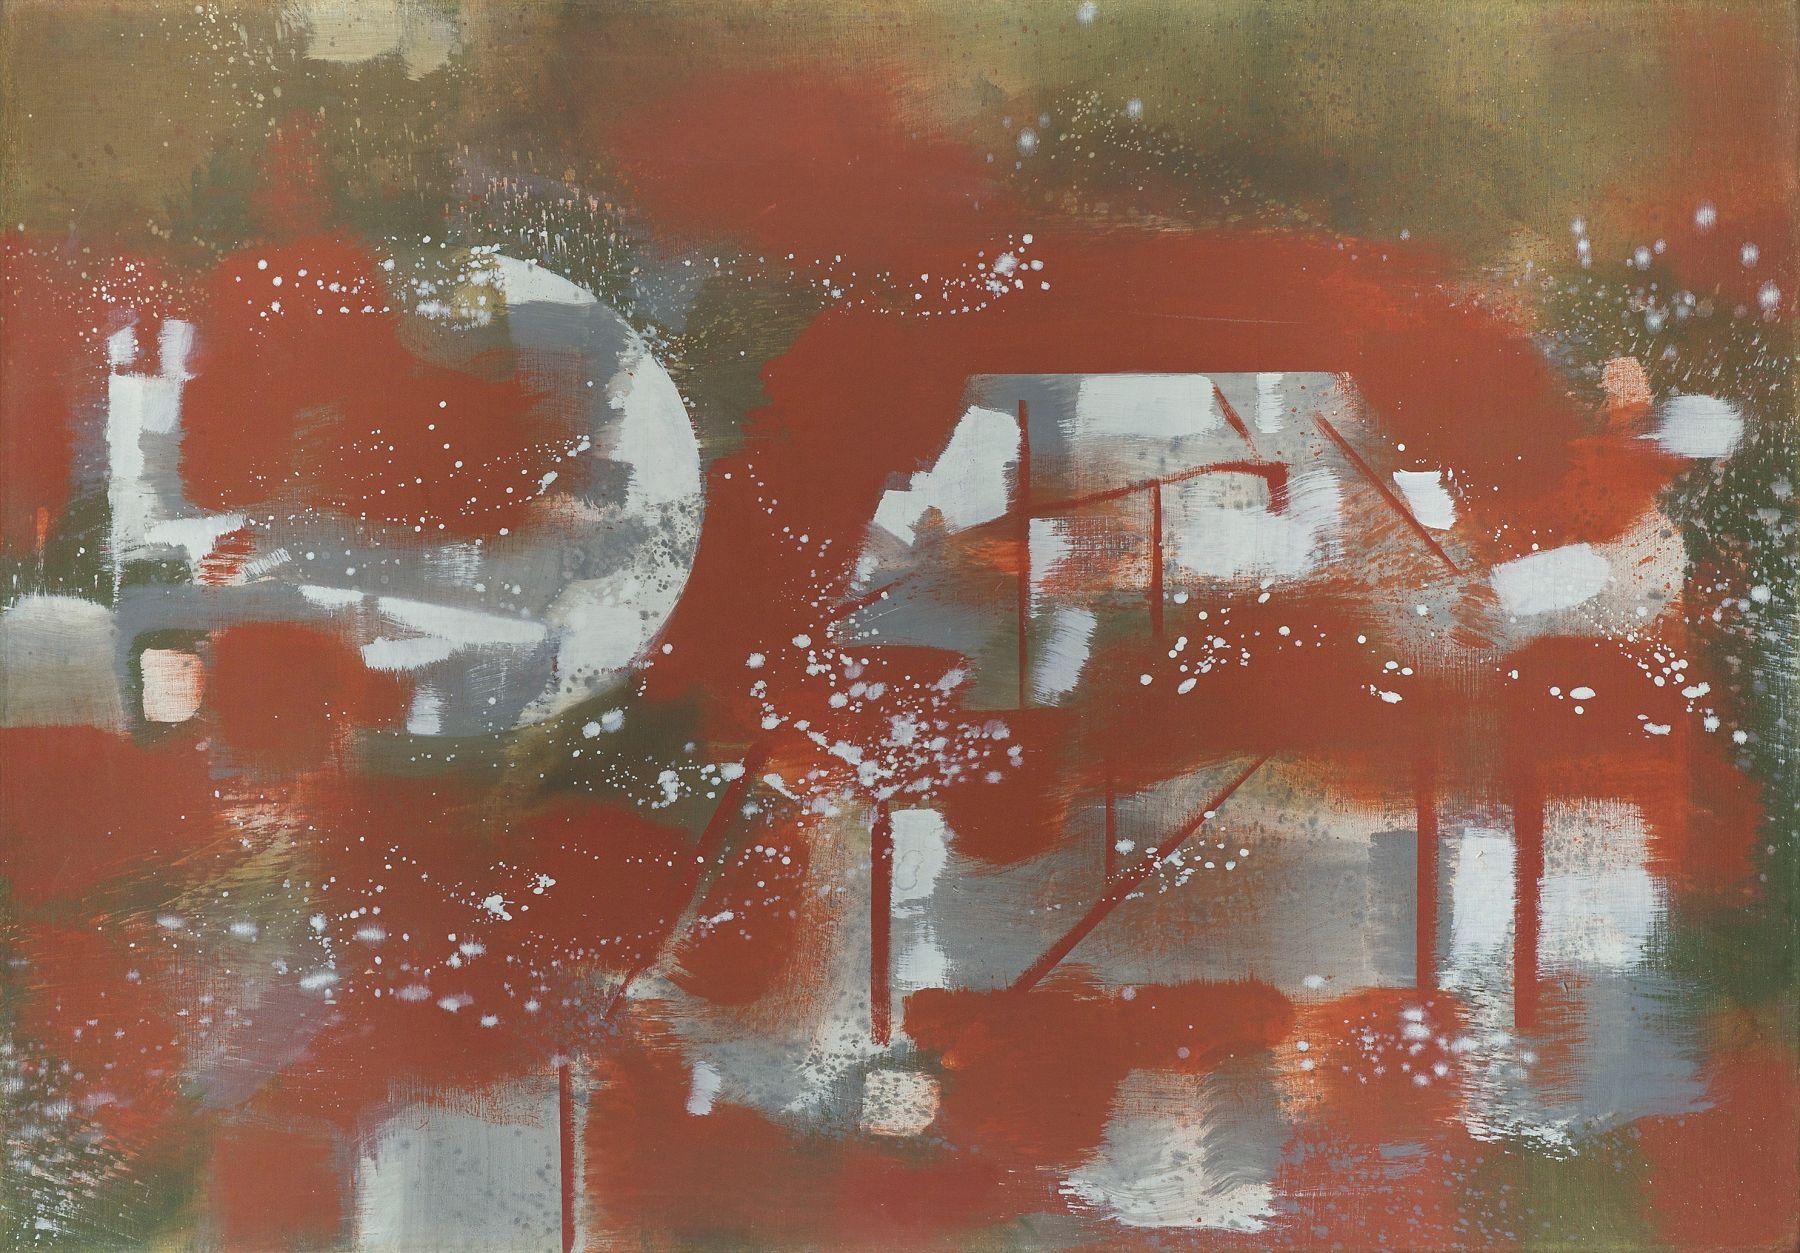 Carl Holty (1900-1973), Abstraction, circa 1952-1953